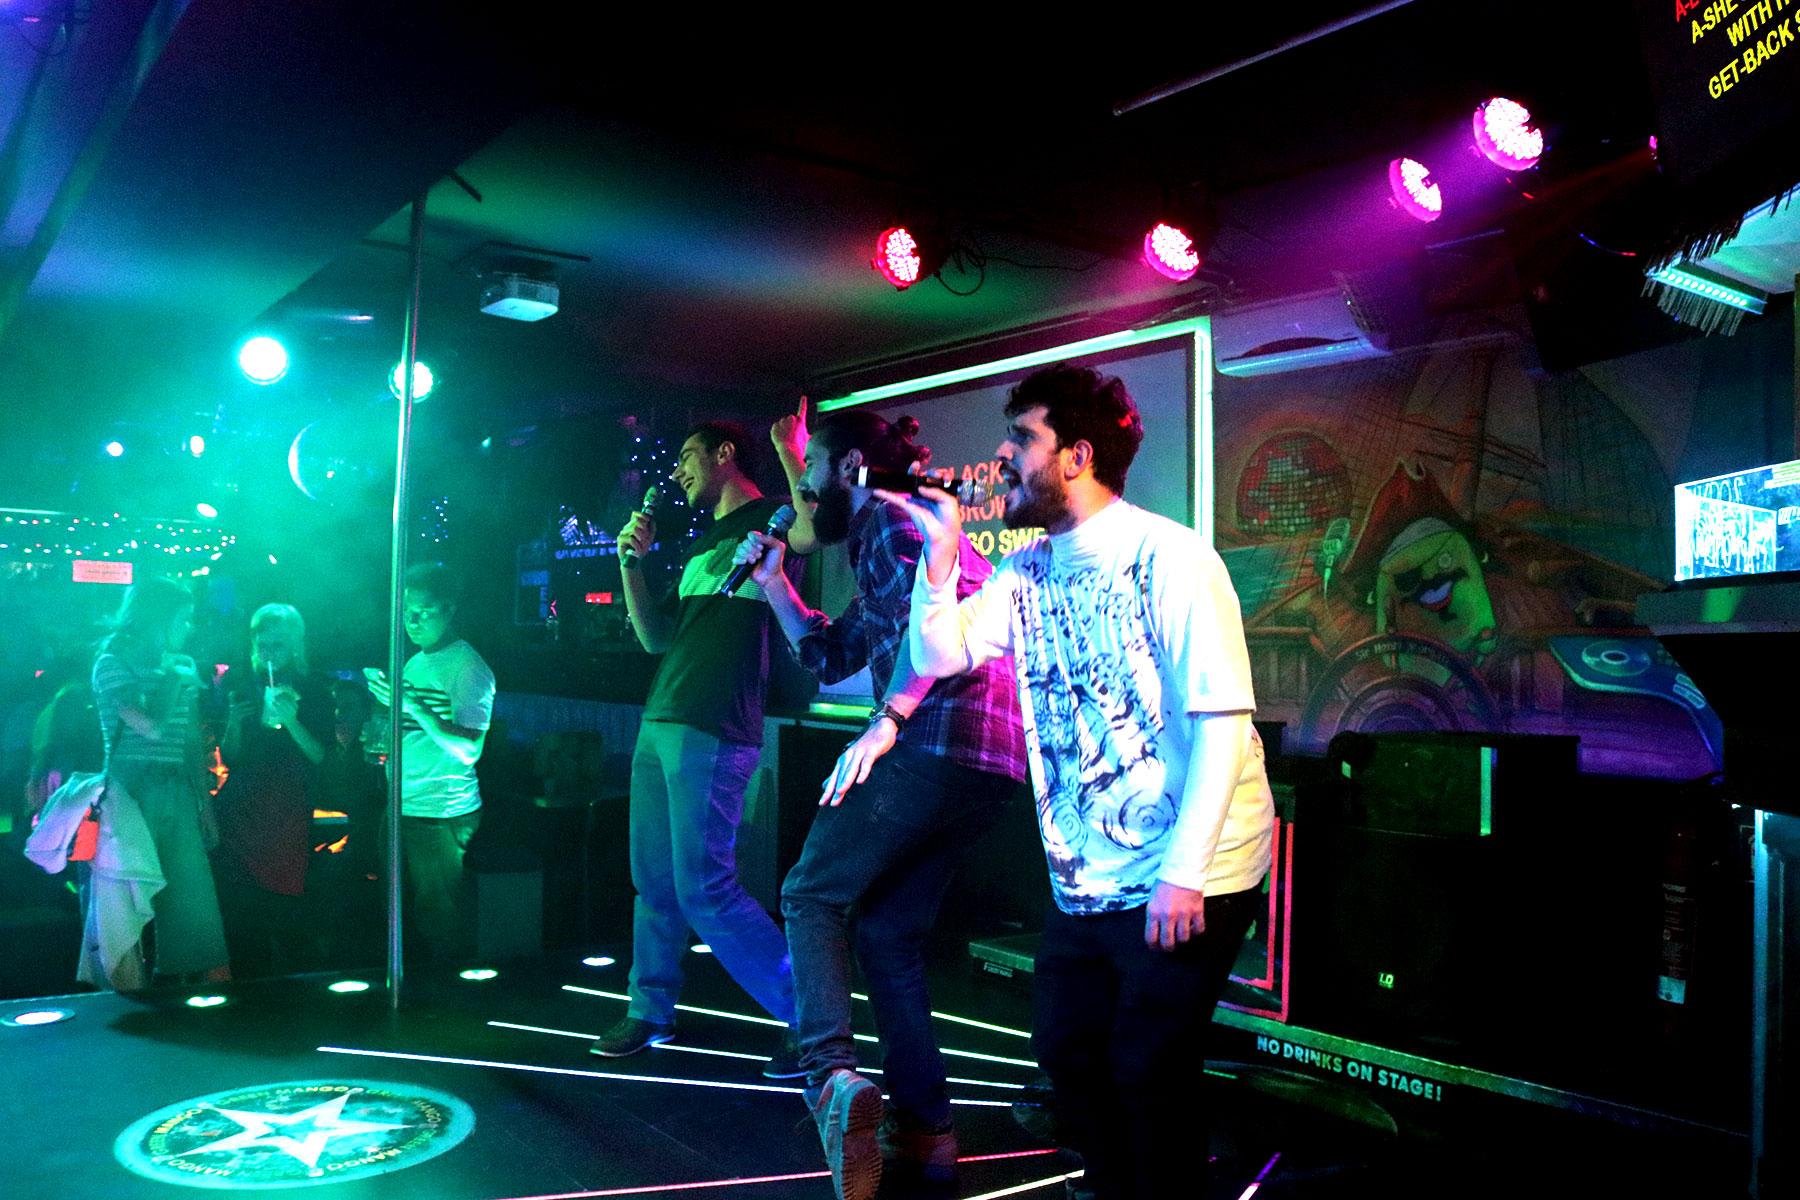 Karaoke_berlin_bearbeitet_IMG_9641.jpg